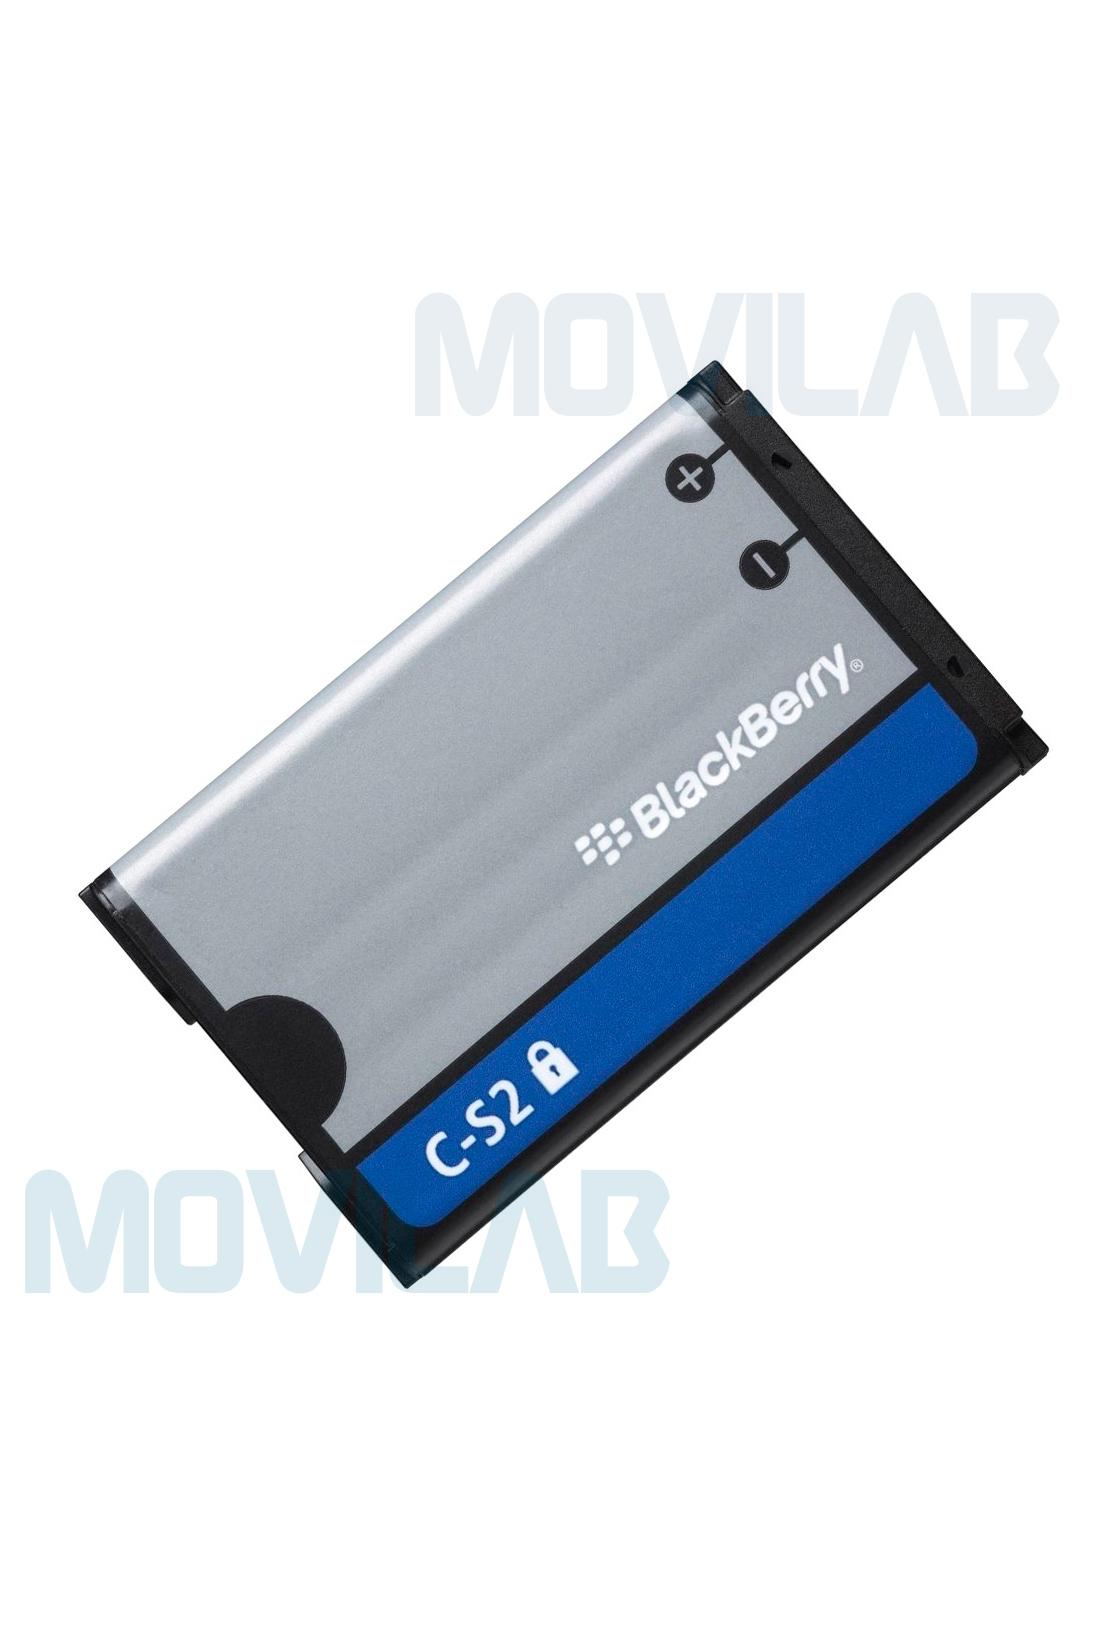 Batería Original Blackberry CS2 8300/8310/8520/8700 OEM